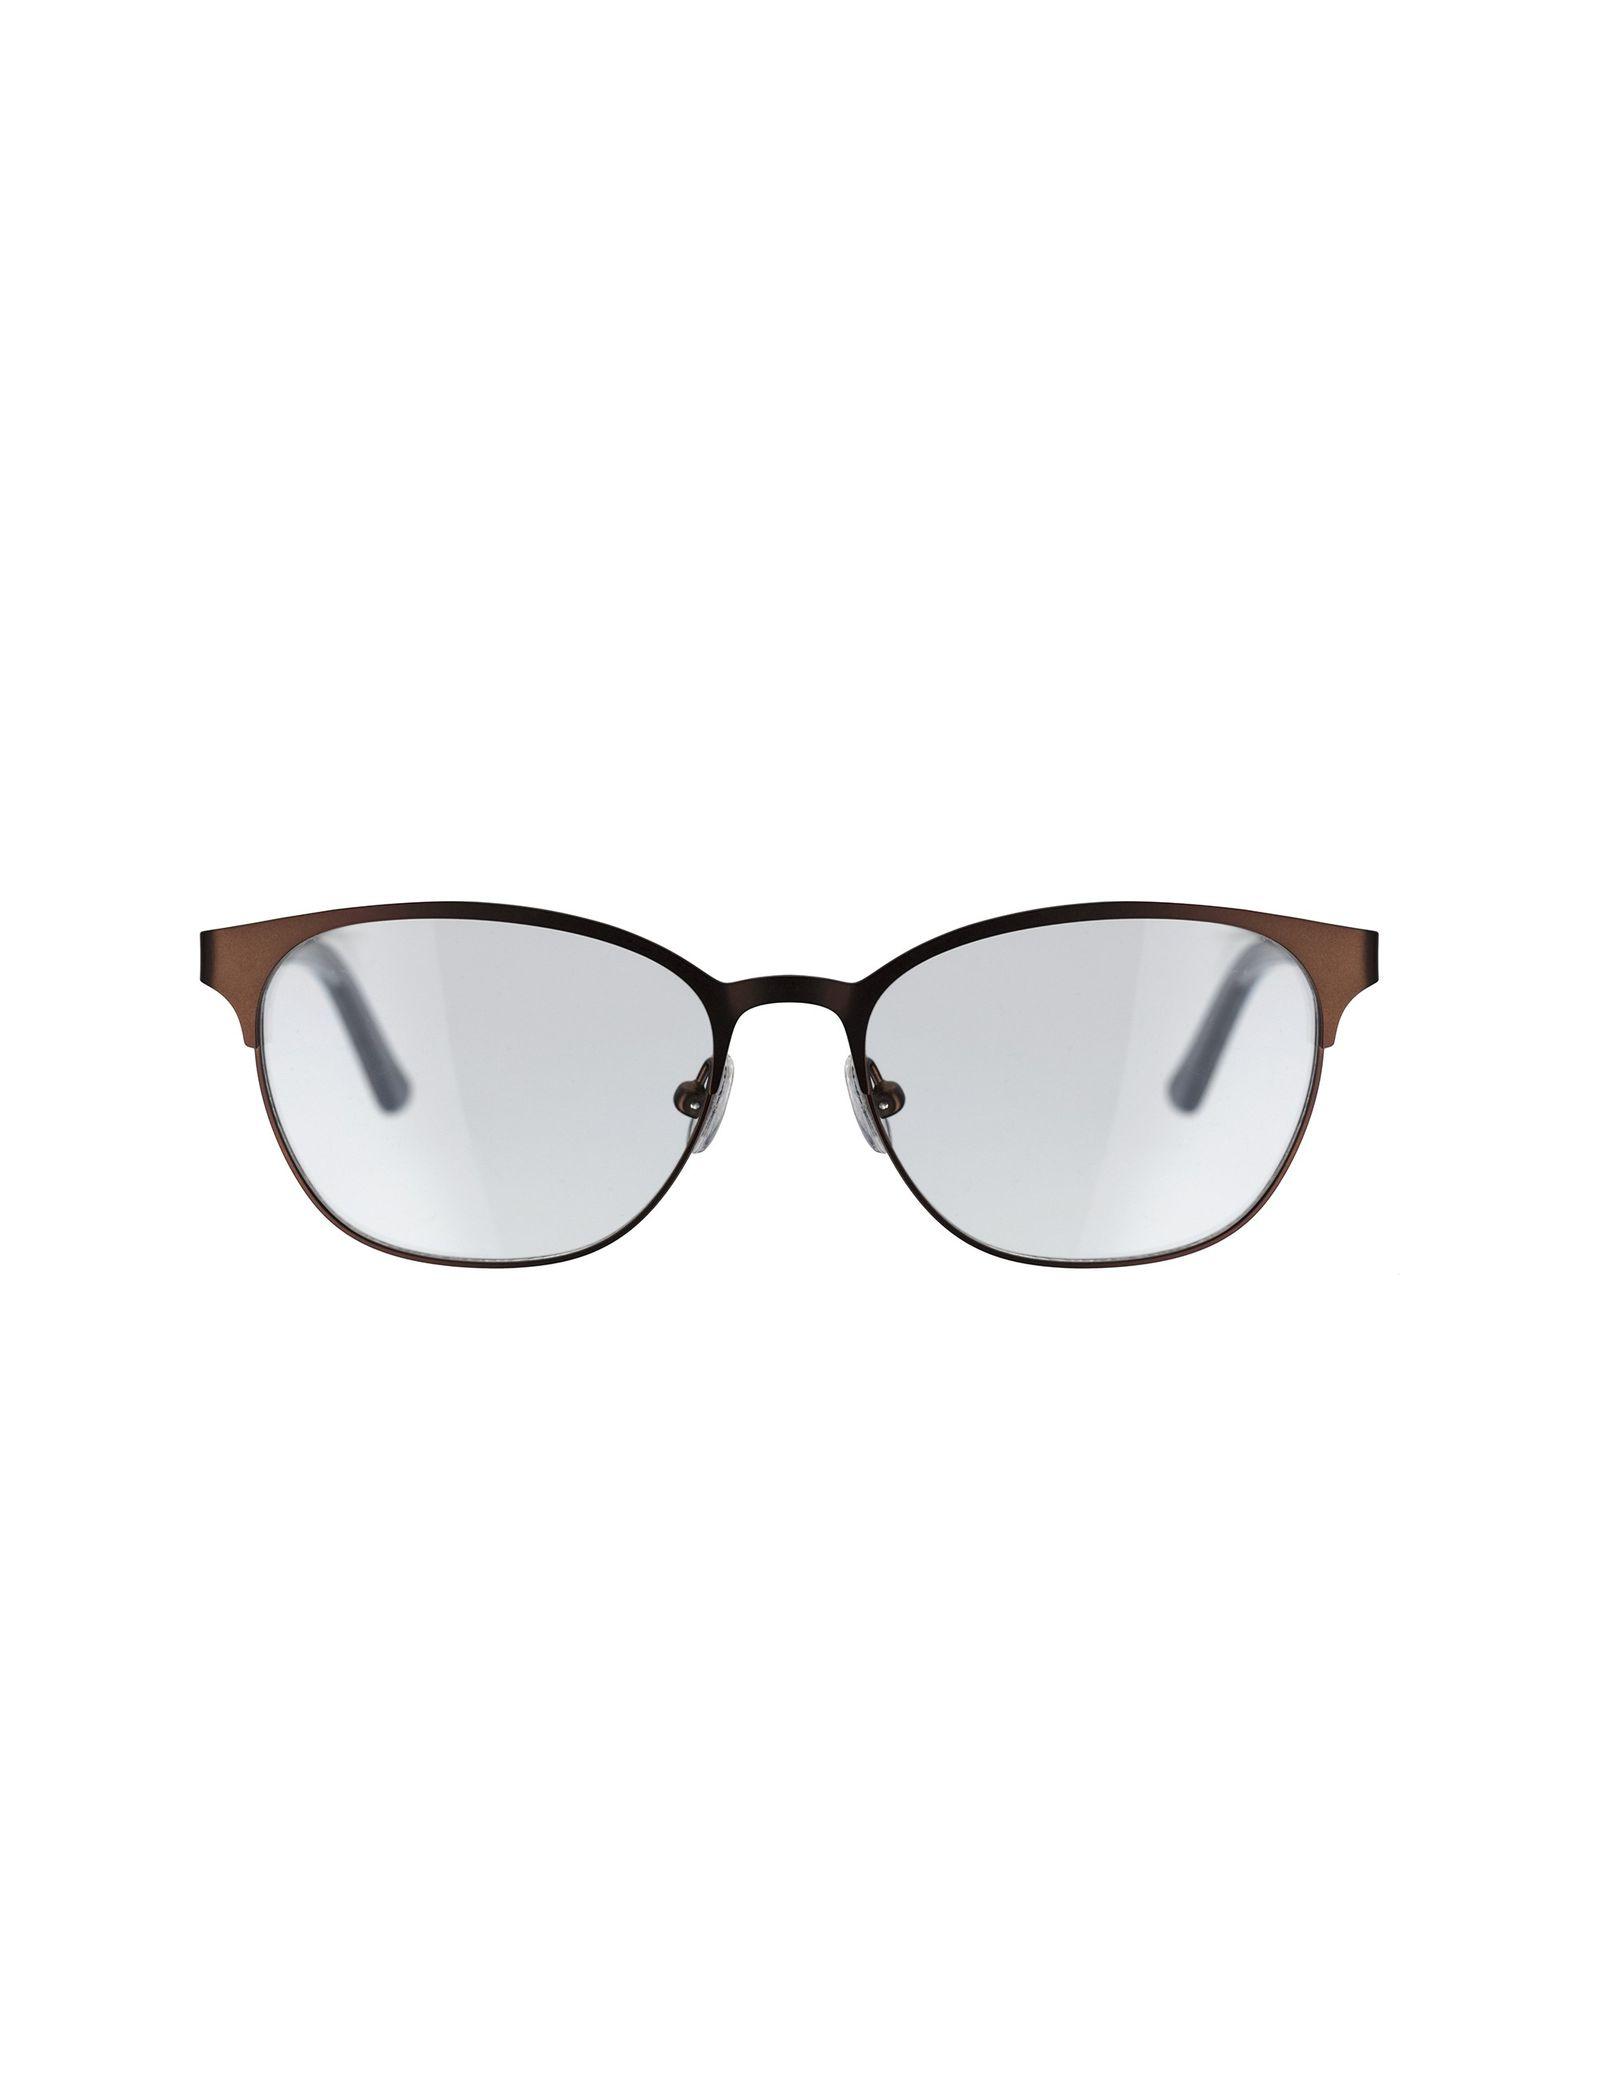 عینک طبی ویفرر زنانه - پپه جینز - قهوه اي - 1